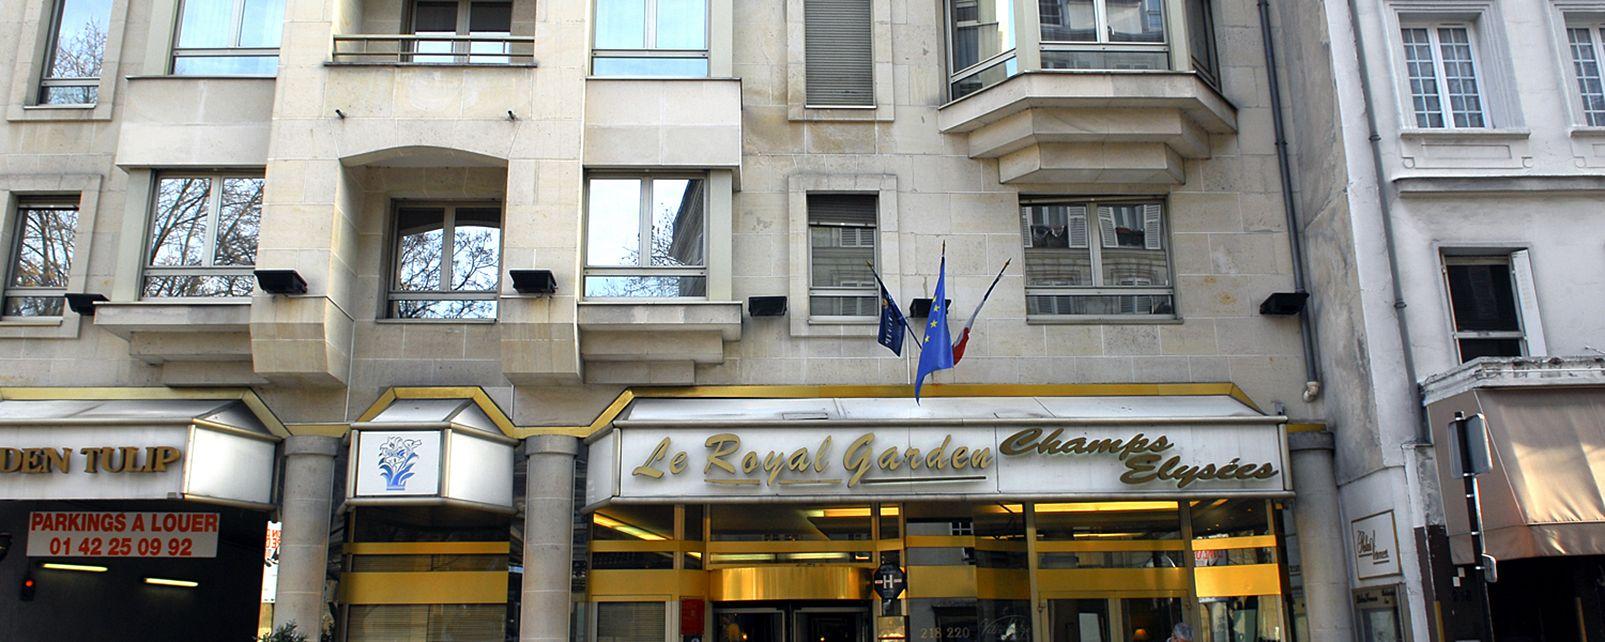 Hotel Golden Tulip Champs Elysees